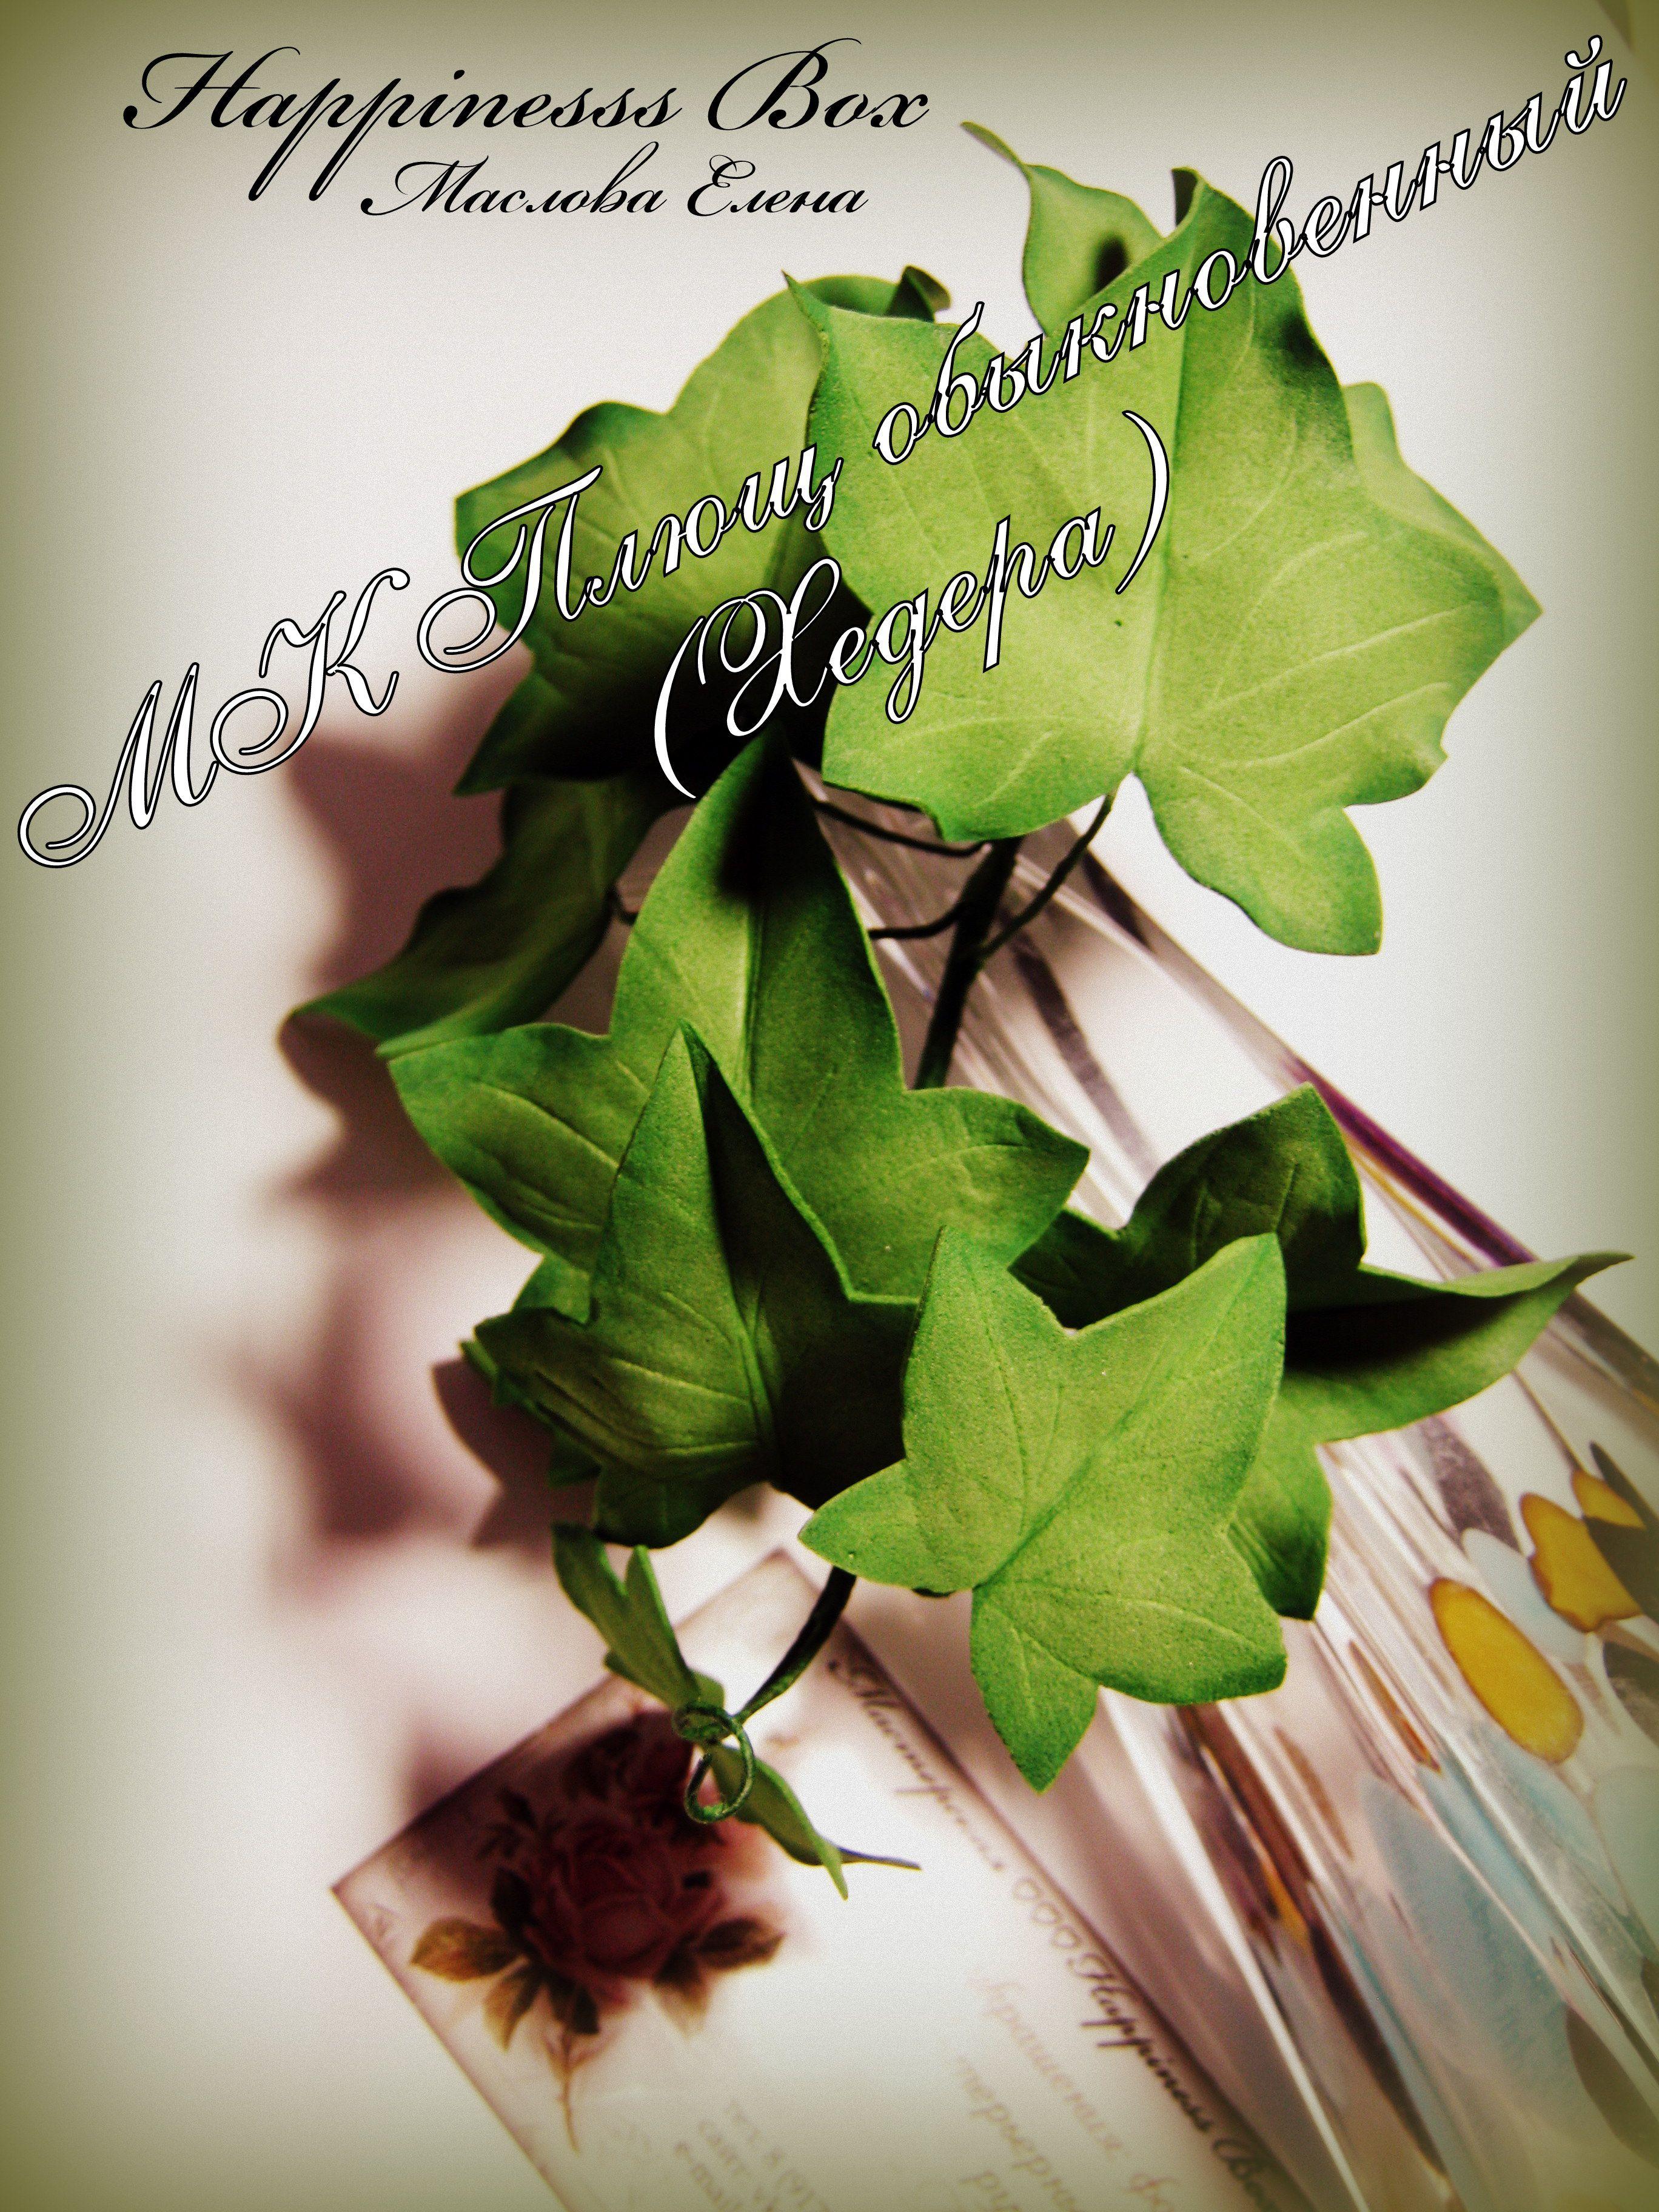 пластичнаязамша хедера масловаелена цветыручнойработы ревелюр мастеркласс украшение фоамиран интерьер флористика happinessbox фом плющ цветы